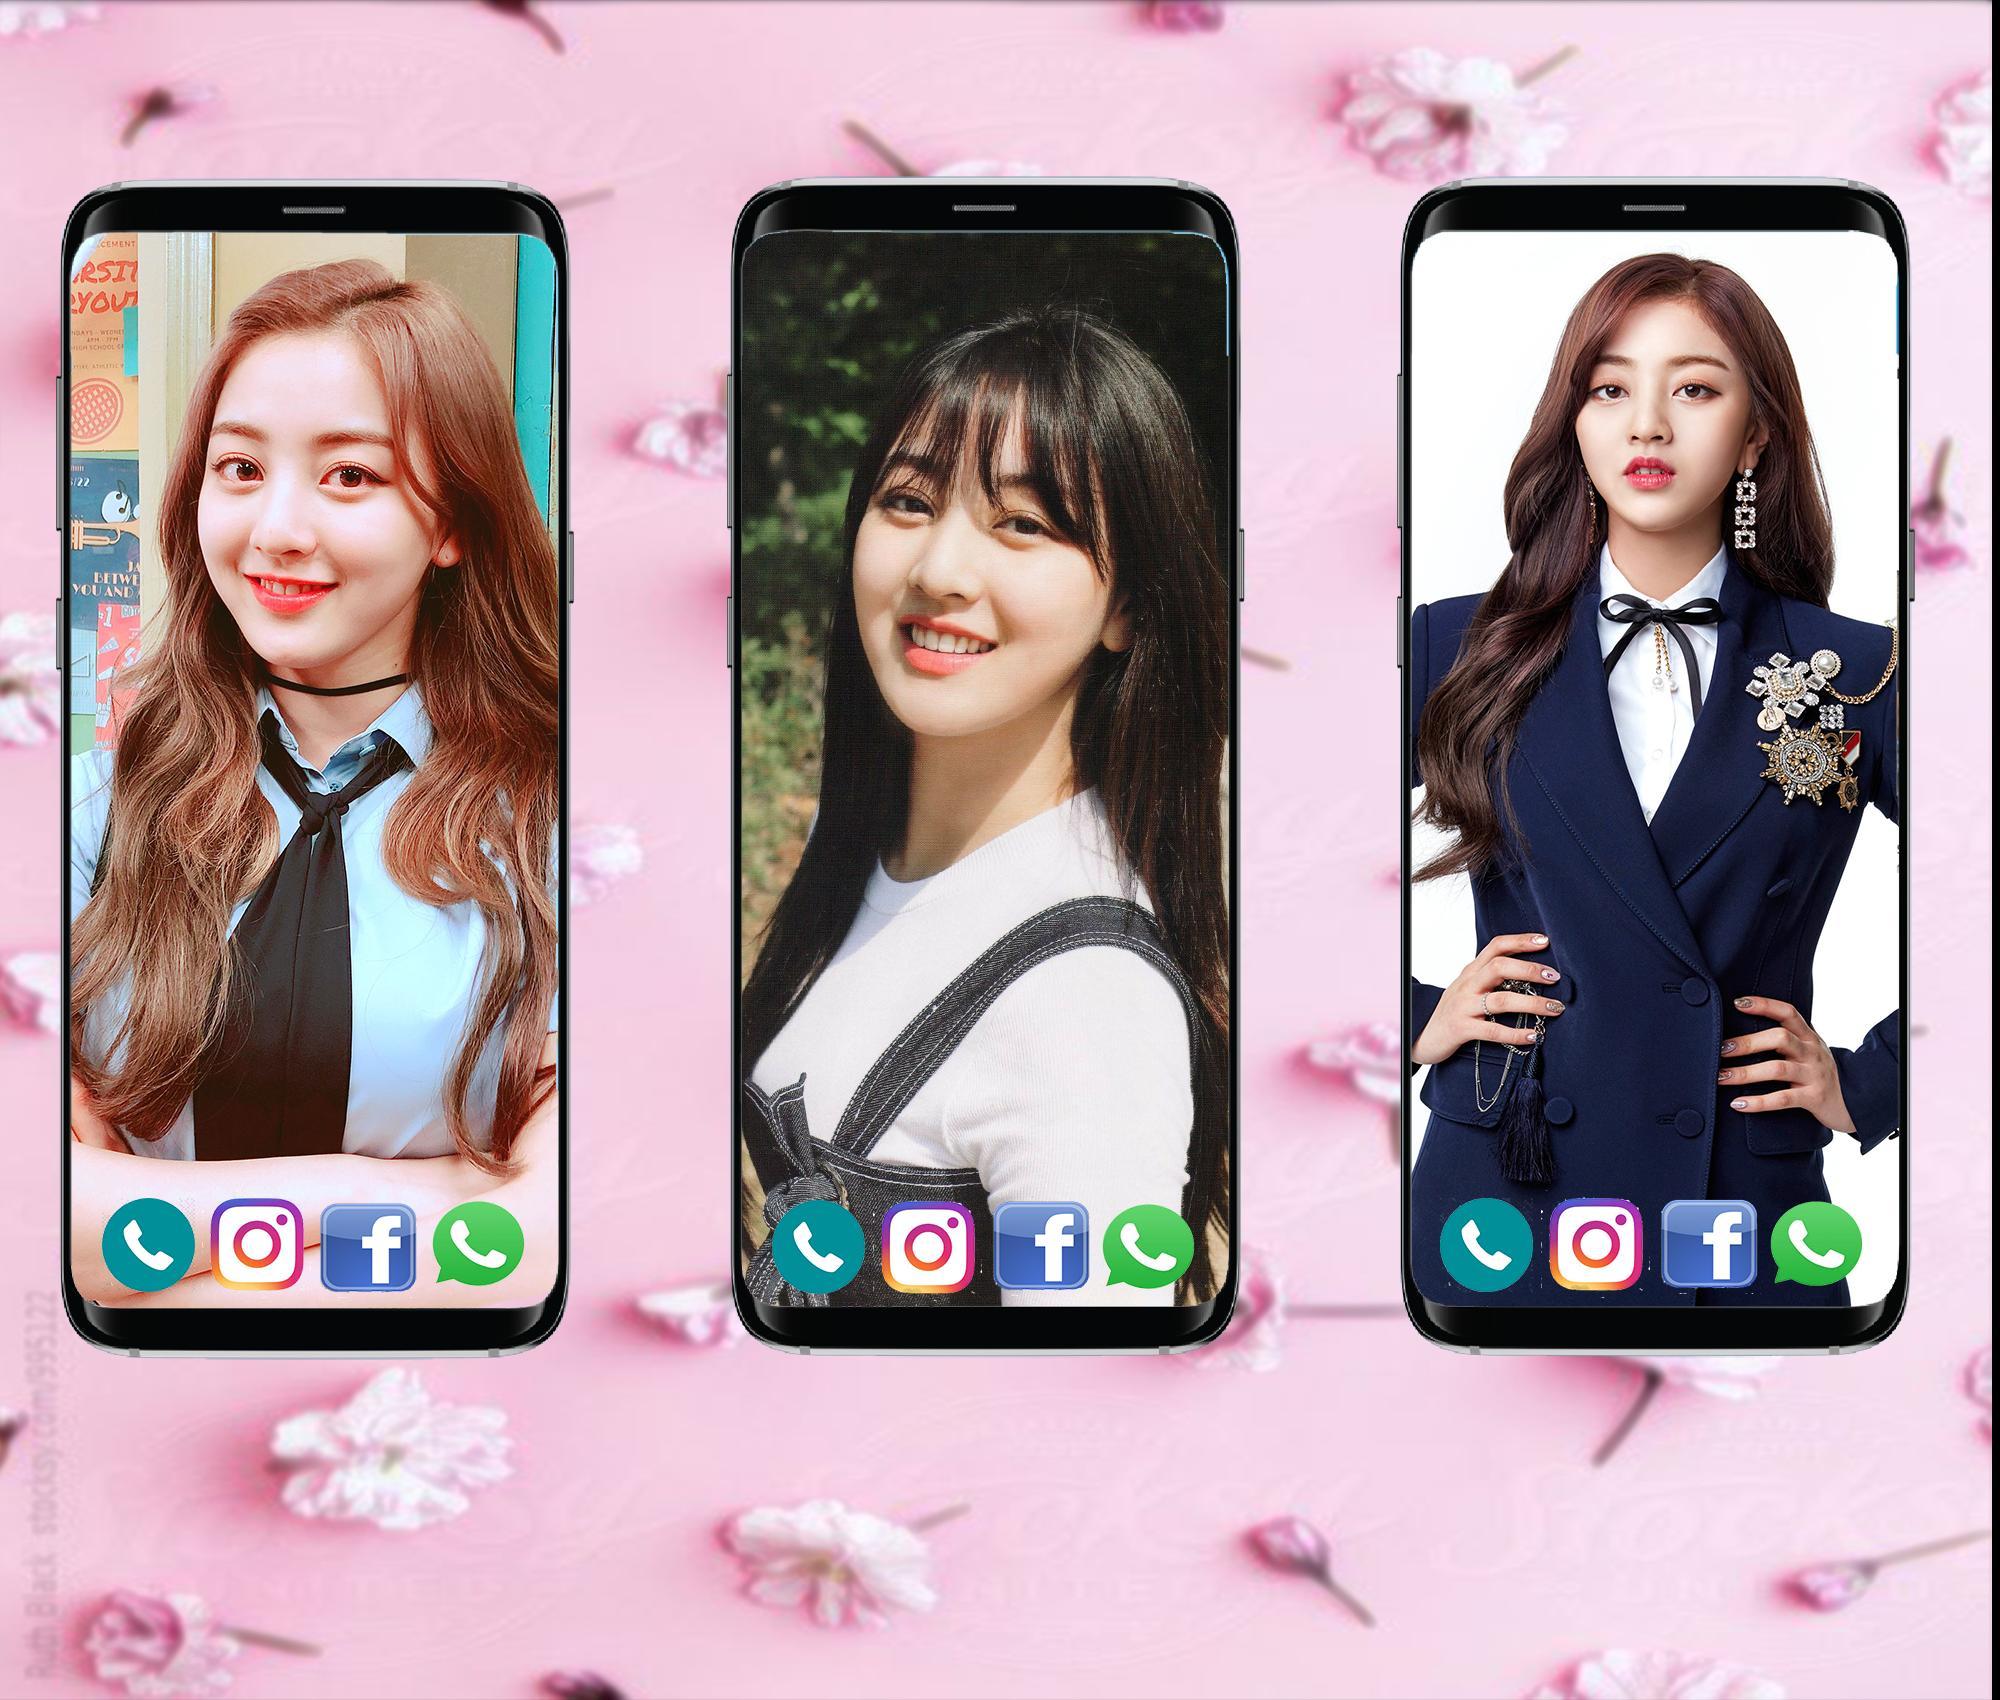 Kpop Jihyo Twice Hd Wallpaper For Android Apk Download